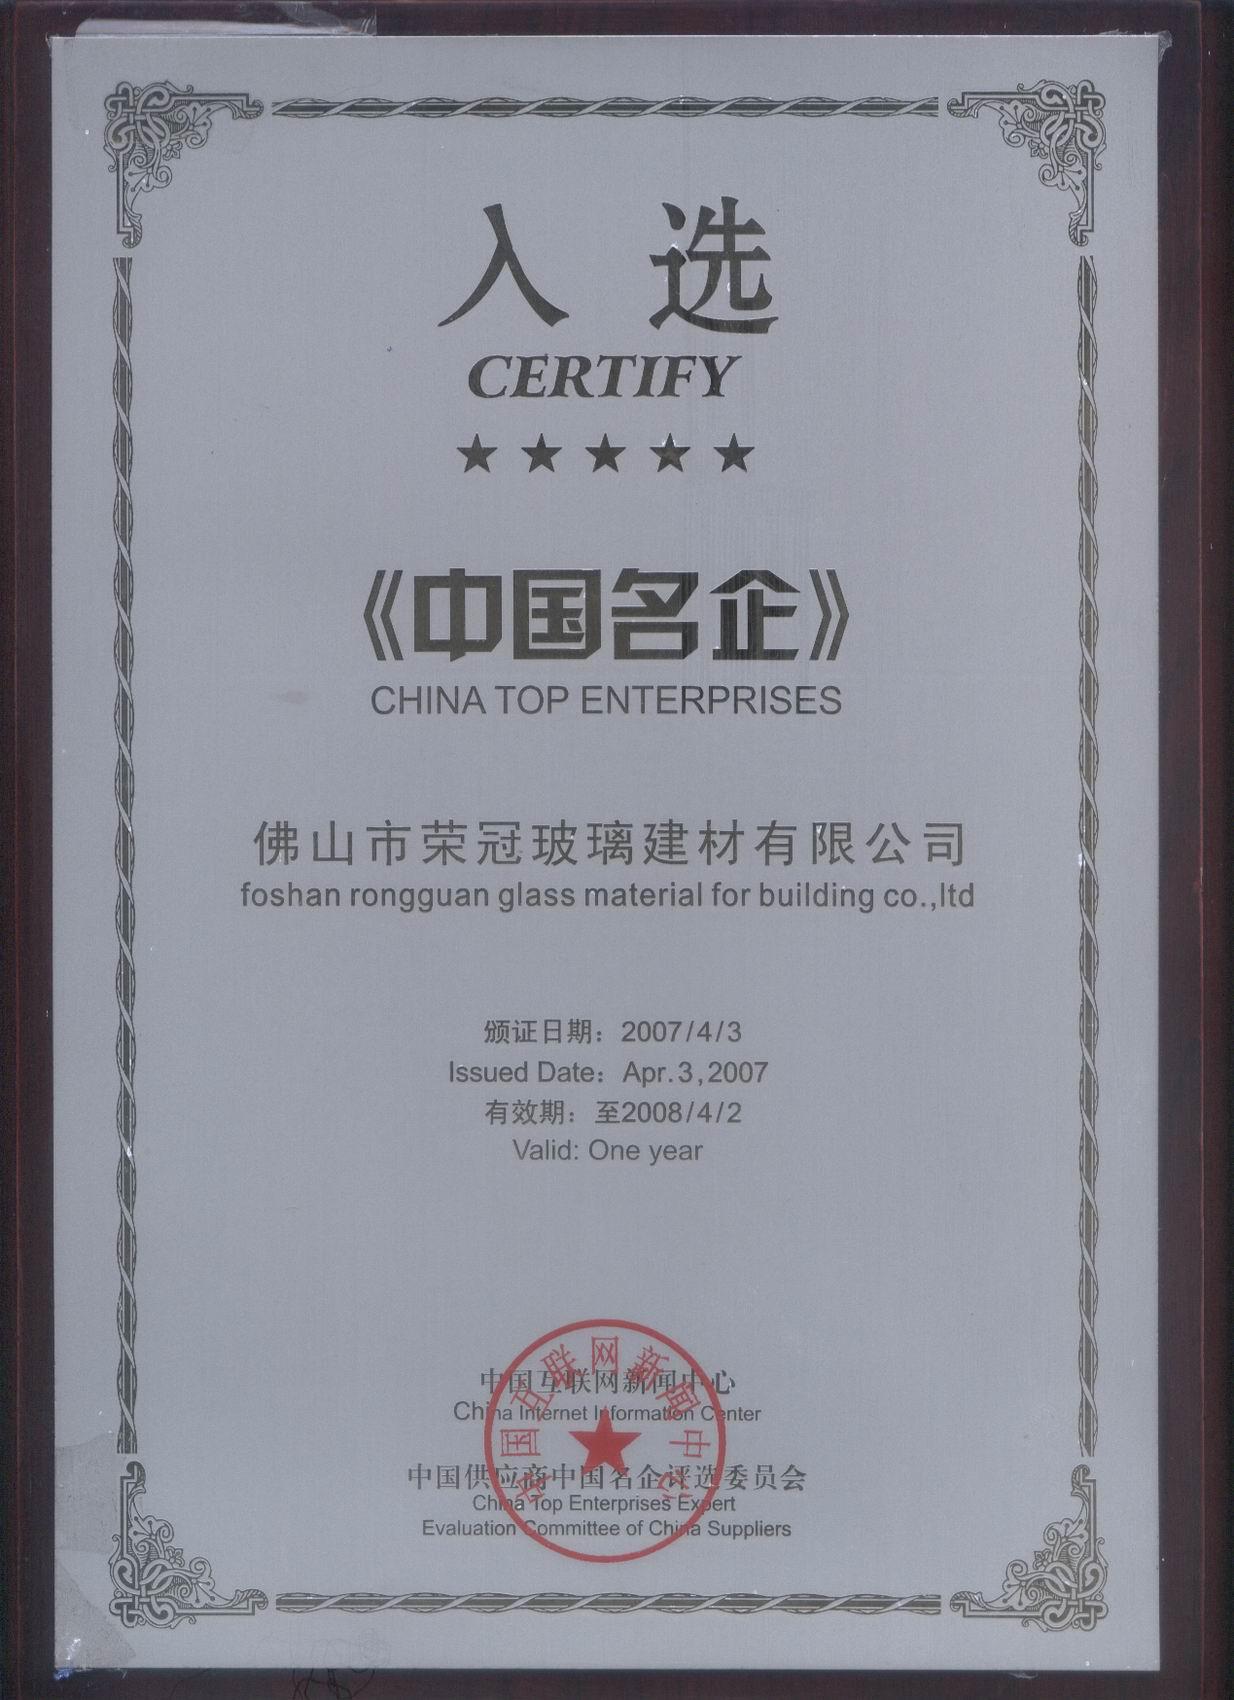 China Top Enterprise